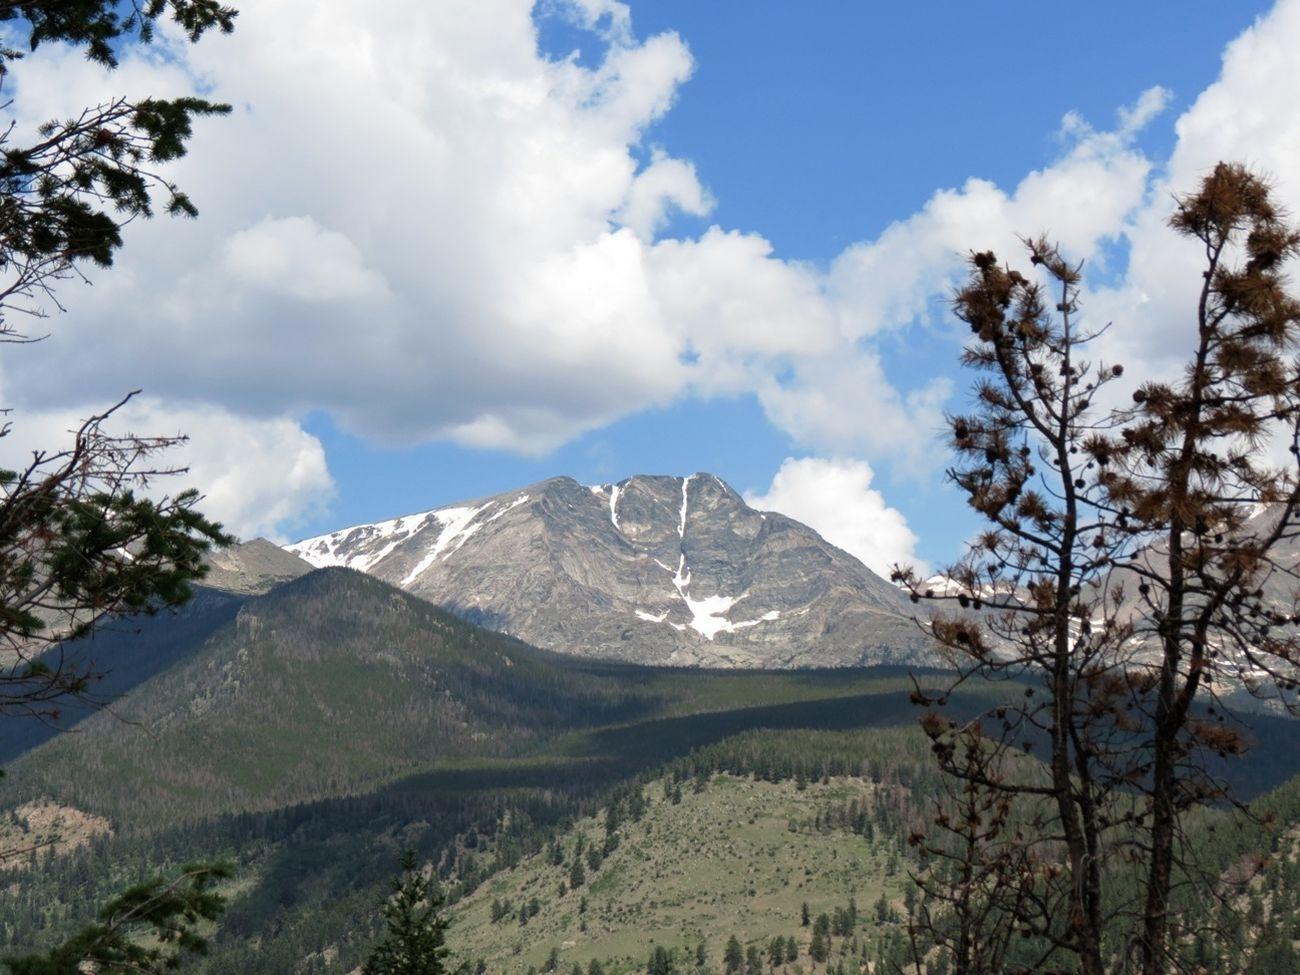 EyeEm Best Shots EyeEm Nature Lover Rocky Mountains EyeEm Best Shots - Landscape